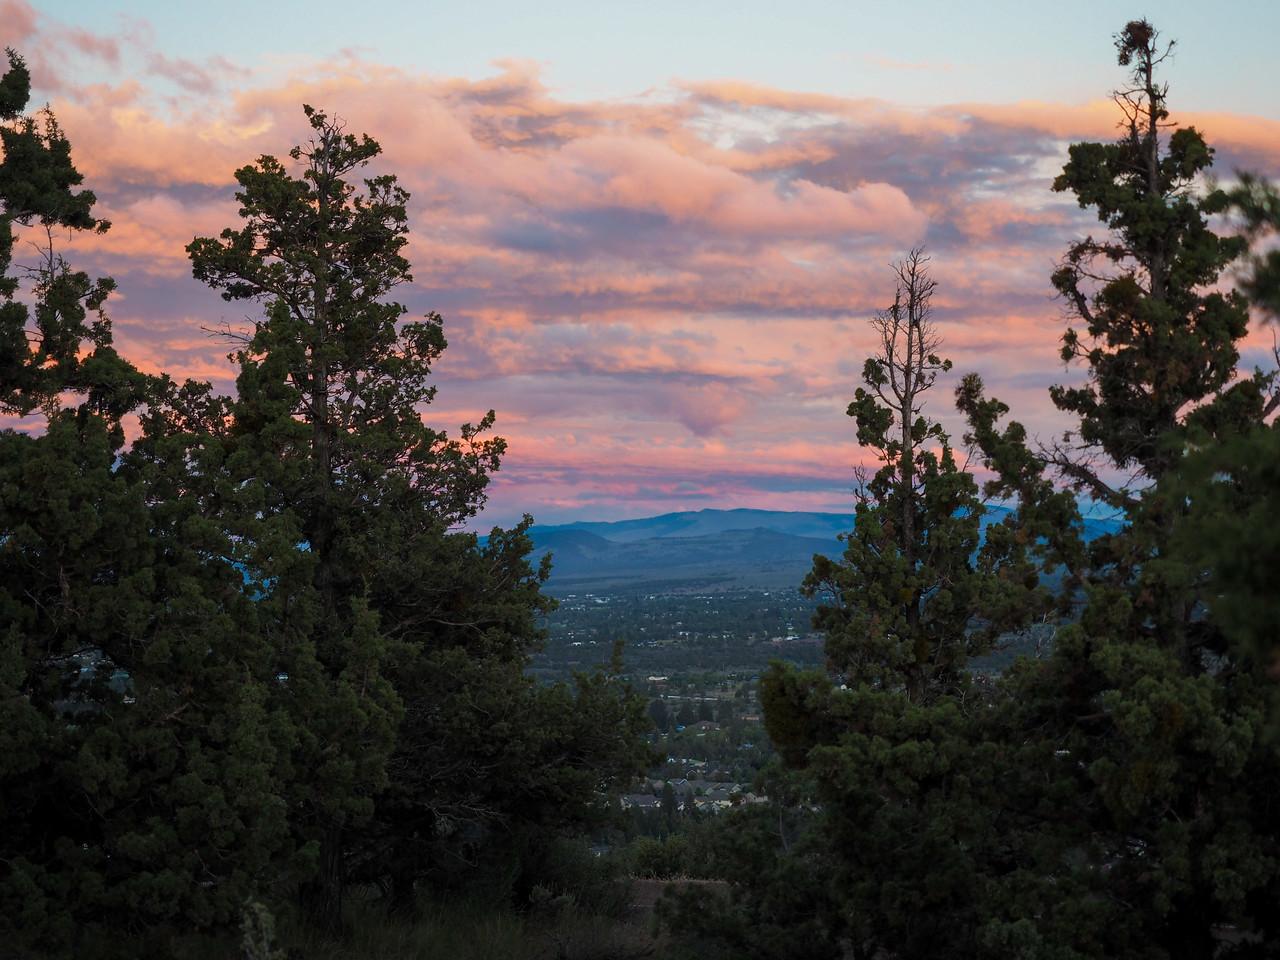 Sunset at Pilot Butte in Bend, Oregon